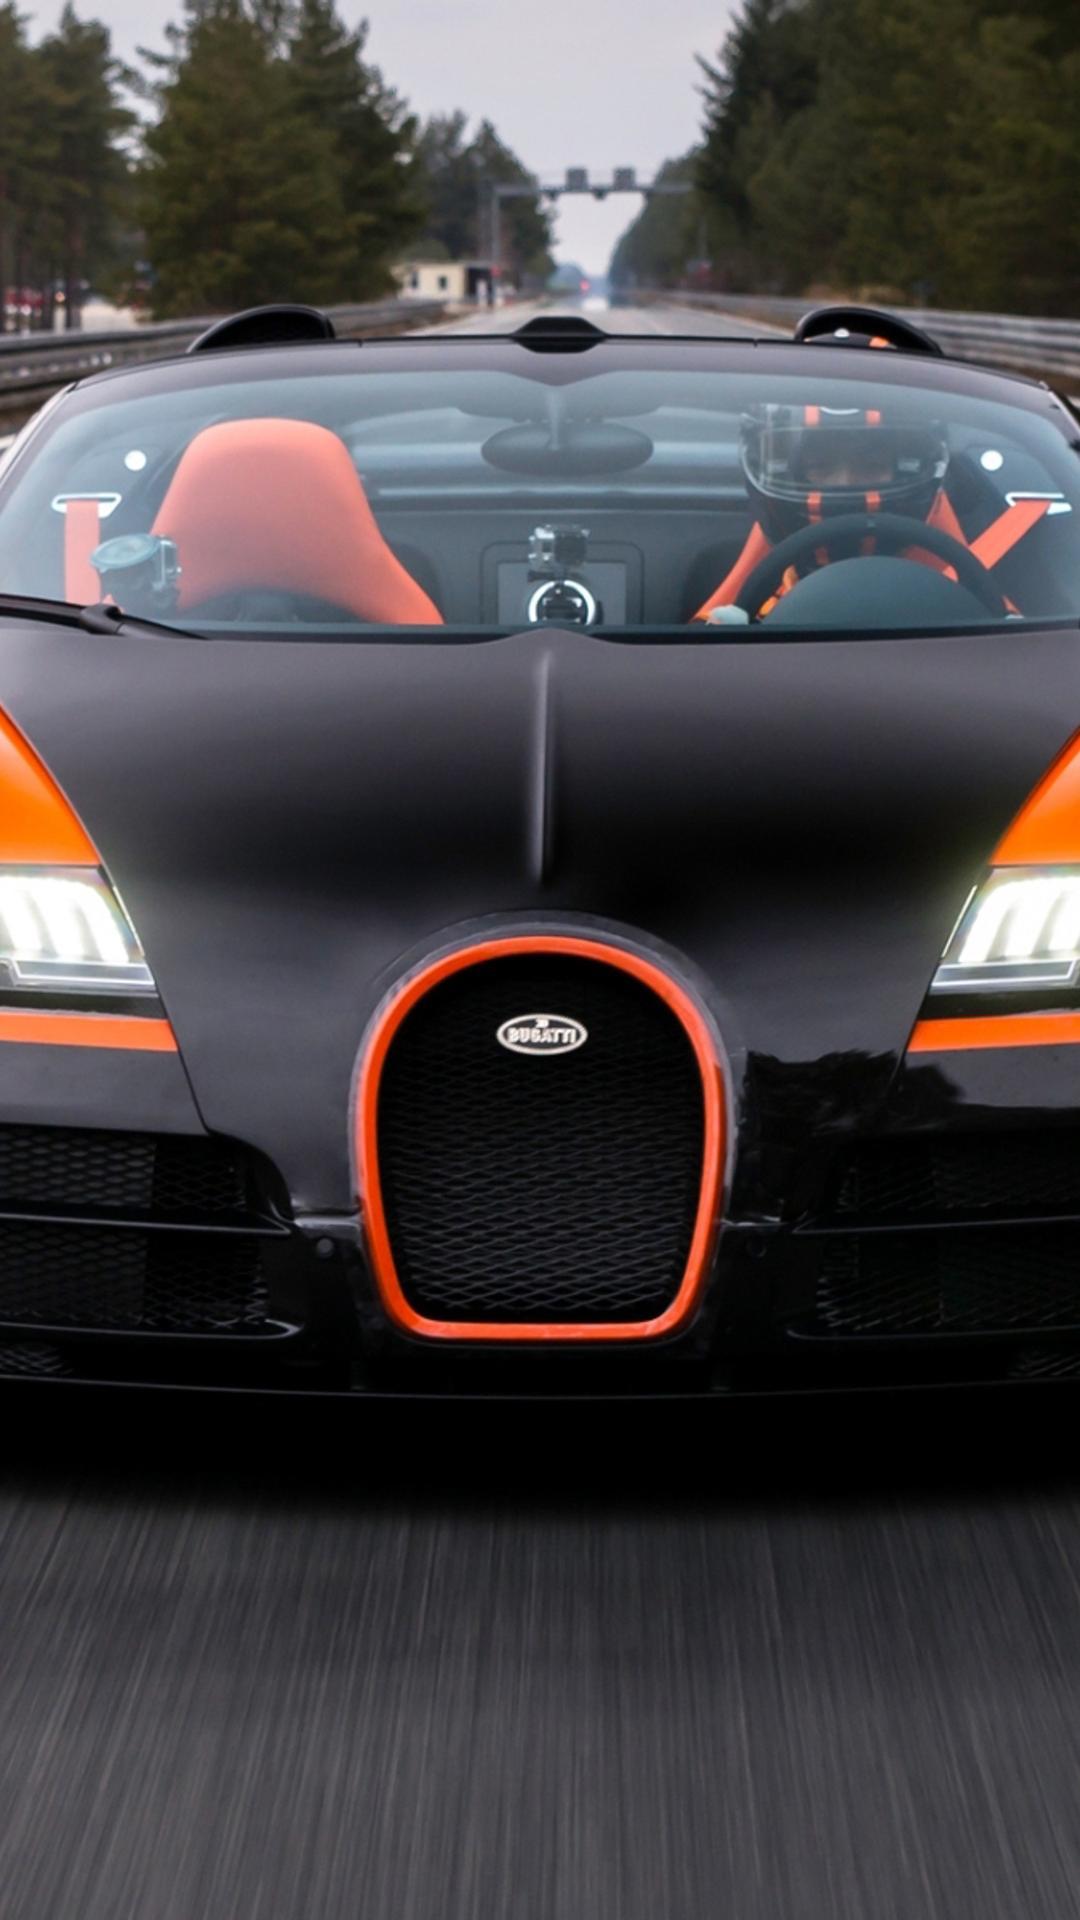 bugatti-veyron-grand-sport-hd-1080x1920 Inspiring Bugatti Veyron Grand Sport Vitesse Wrc Cars Trend